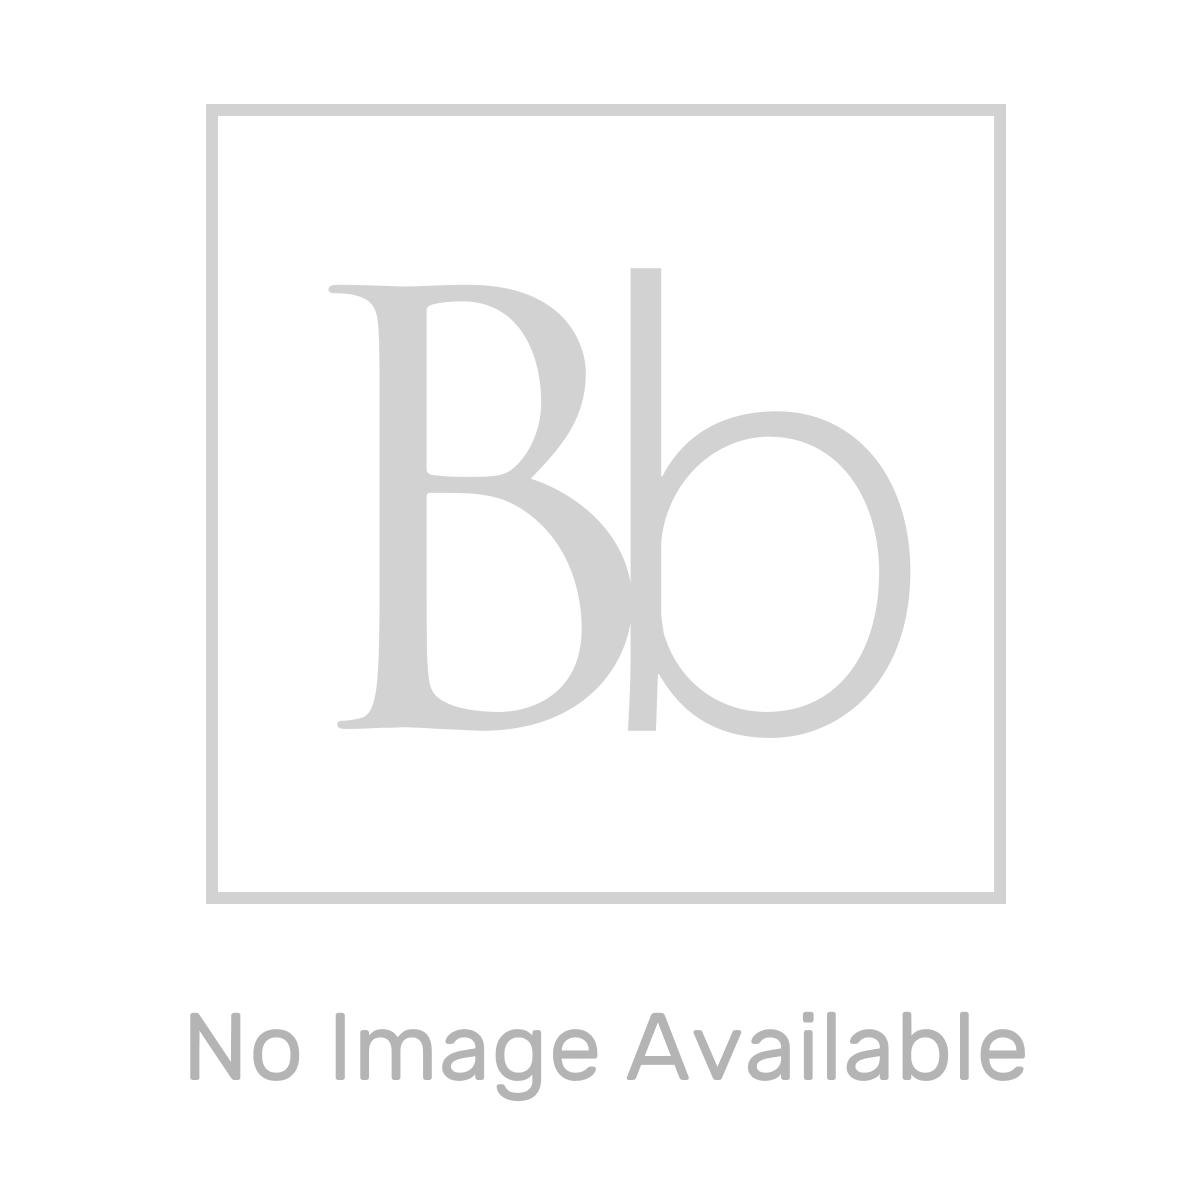 RAK Series 600 1 Tap Hole Basin with Full Pedestal